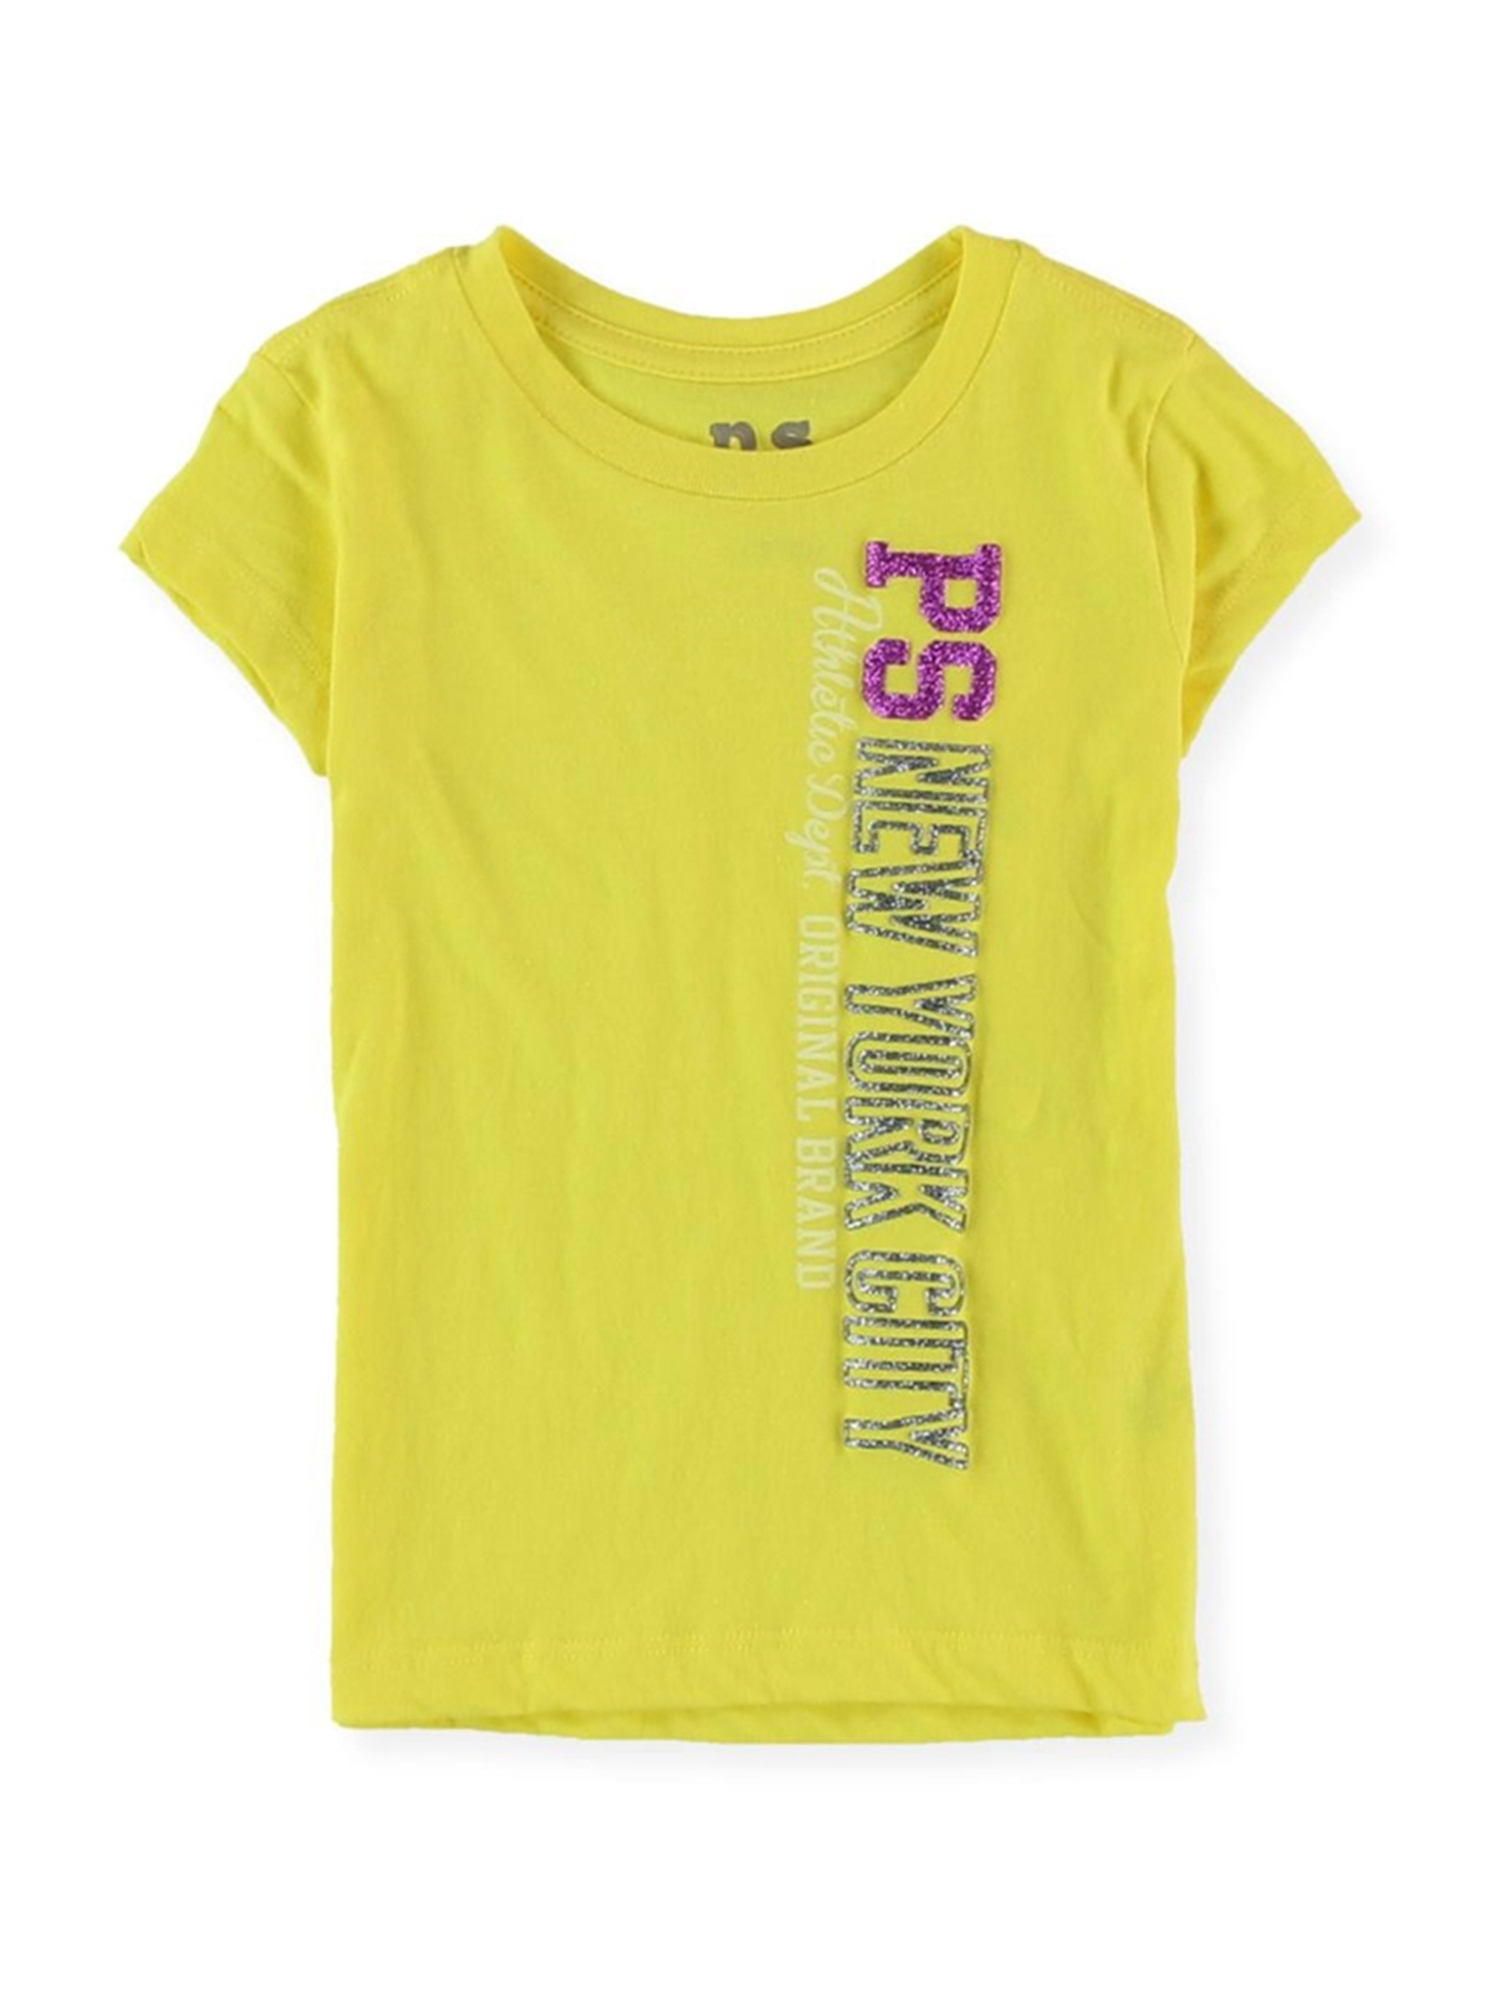 Aeropostale Girls Athl. Dept. Graphic T-Shirt